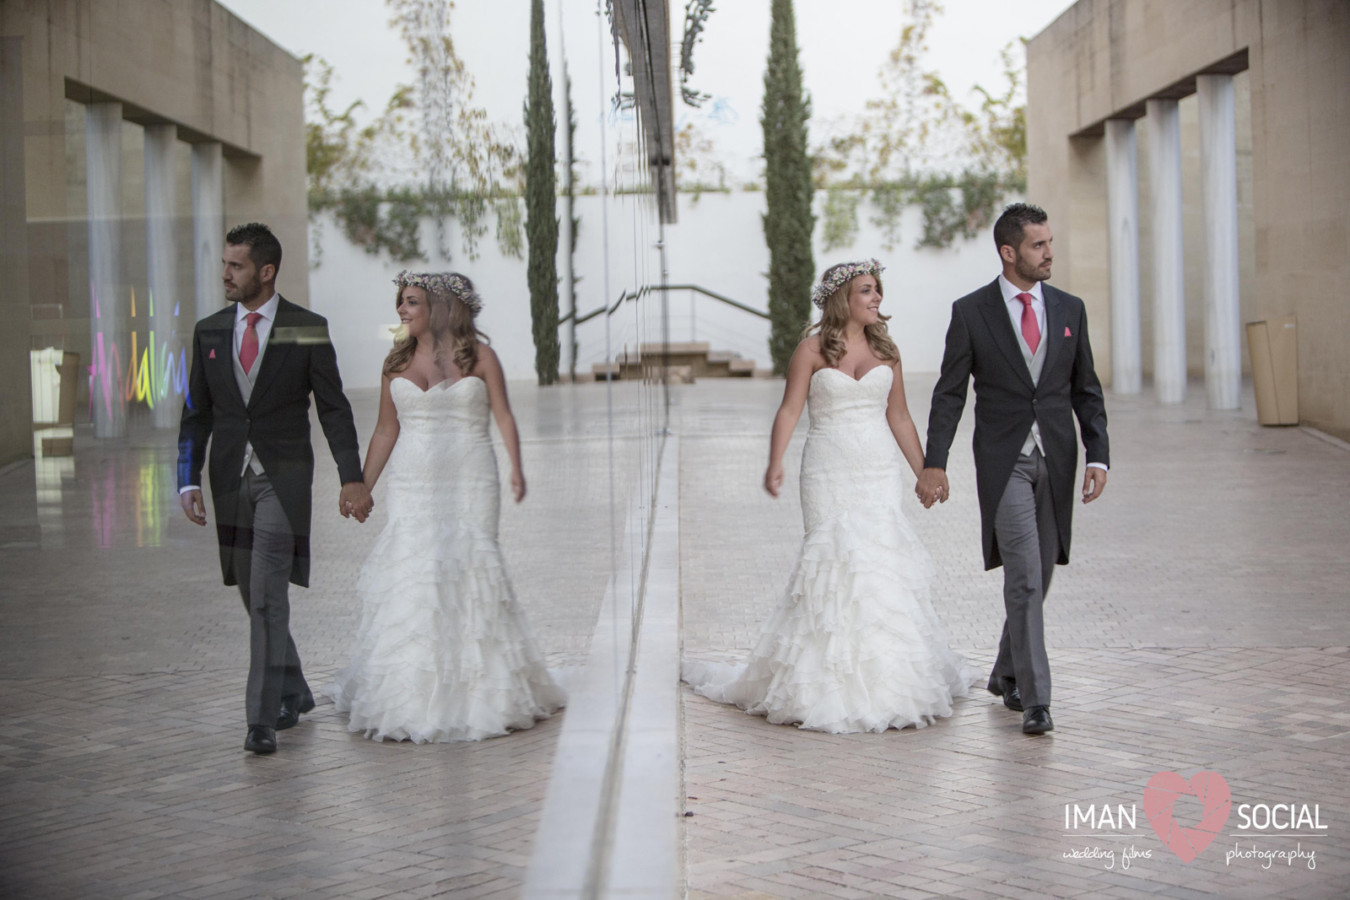 77B1119 Juan Antonio y Mónica - Postboda - video boda cordoba